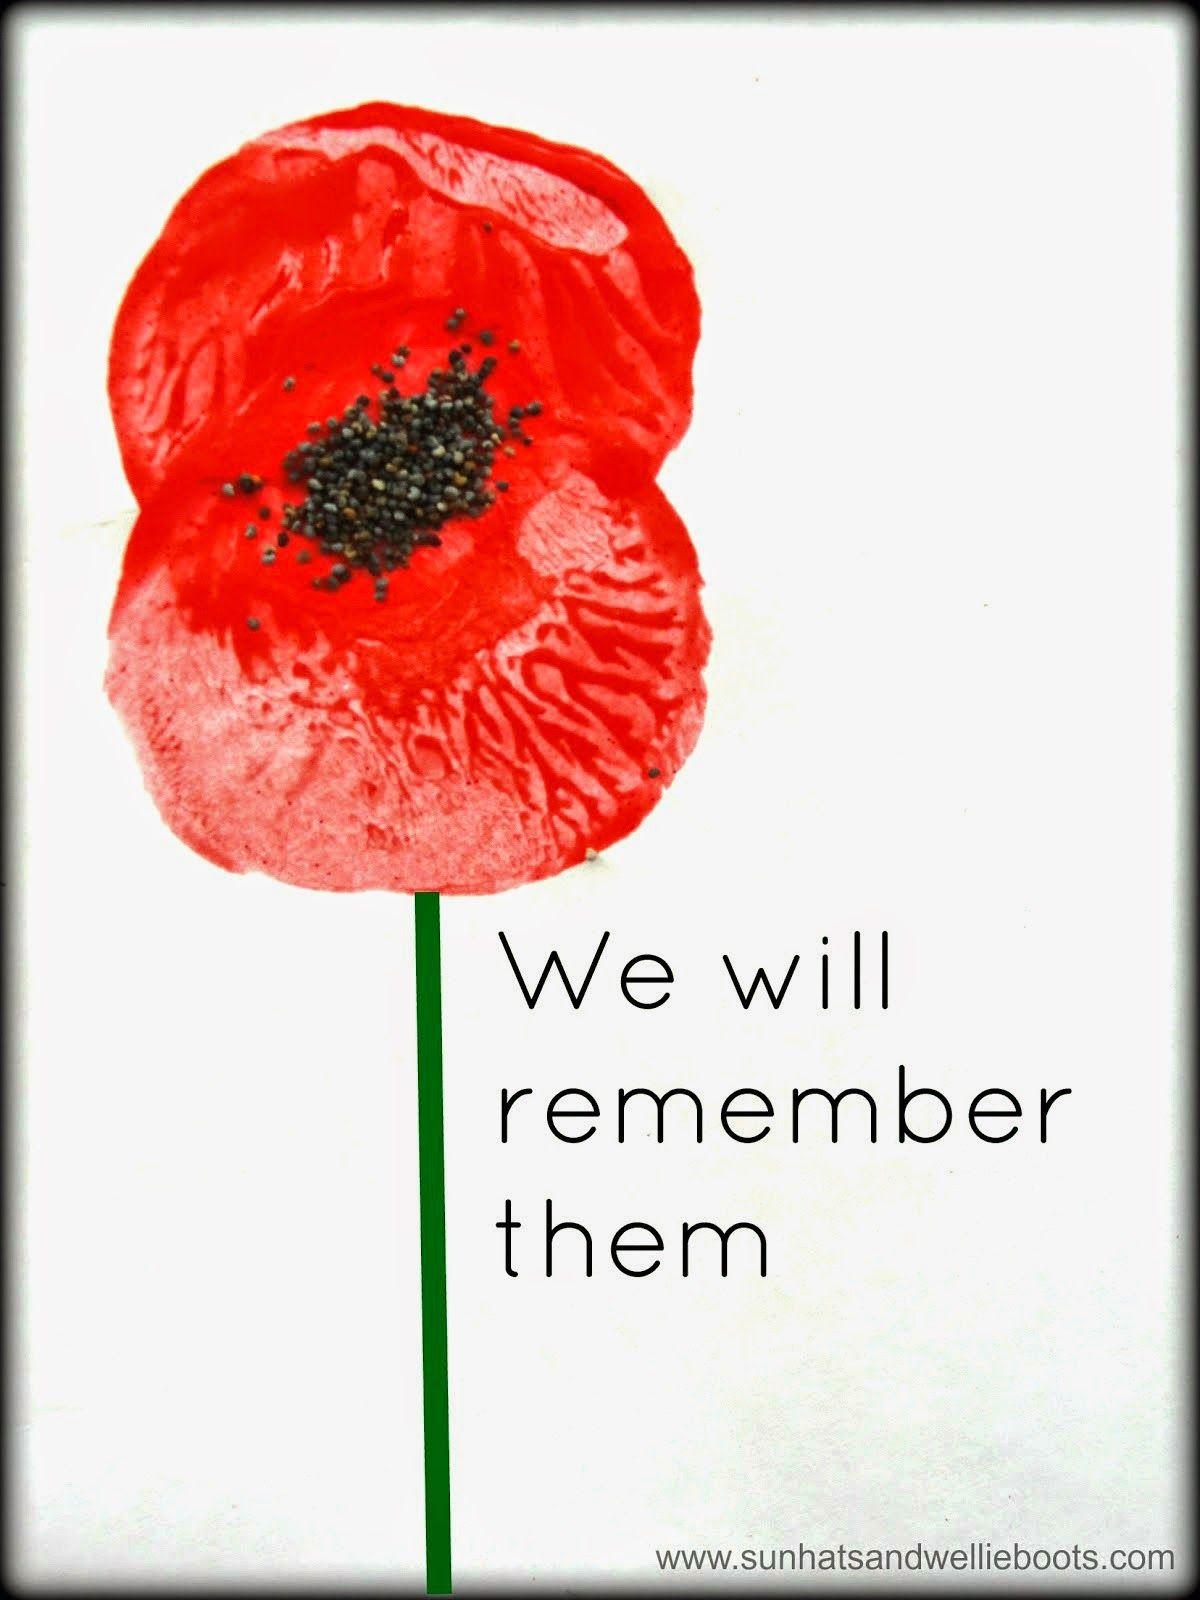 sun hats u0026 wellie boots remembrance poppy prints u2026 pinteres u2026